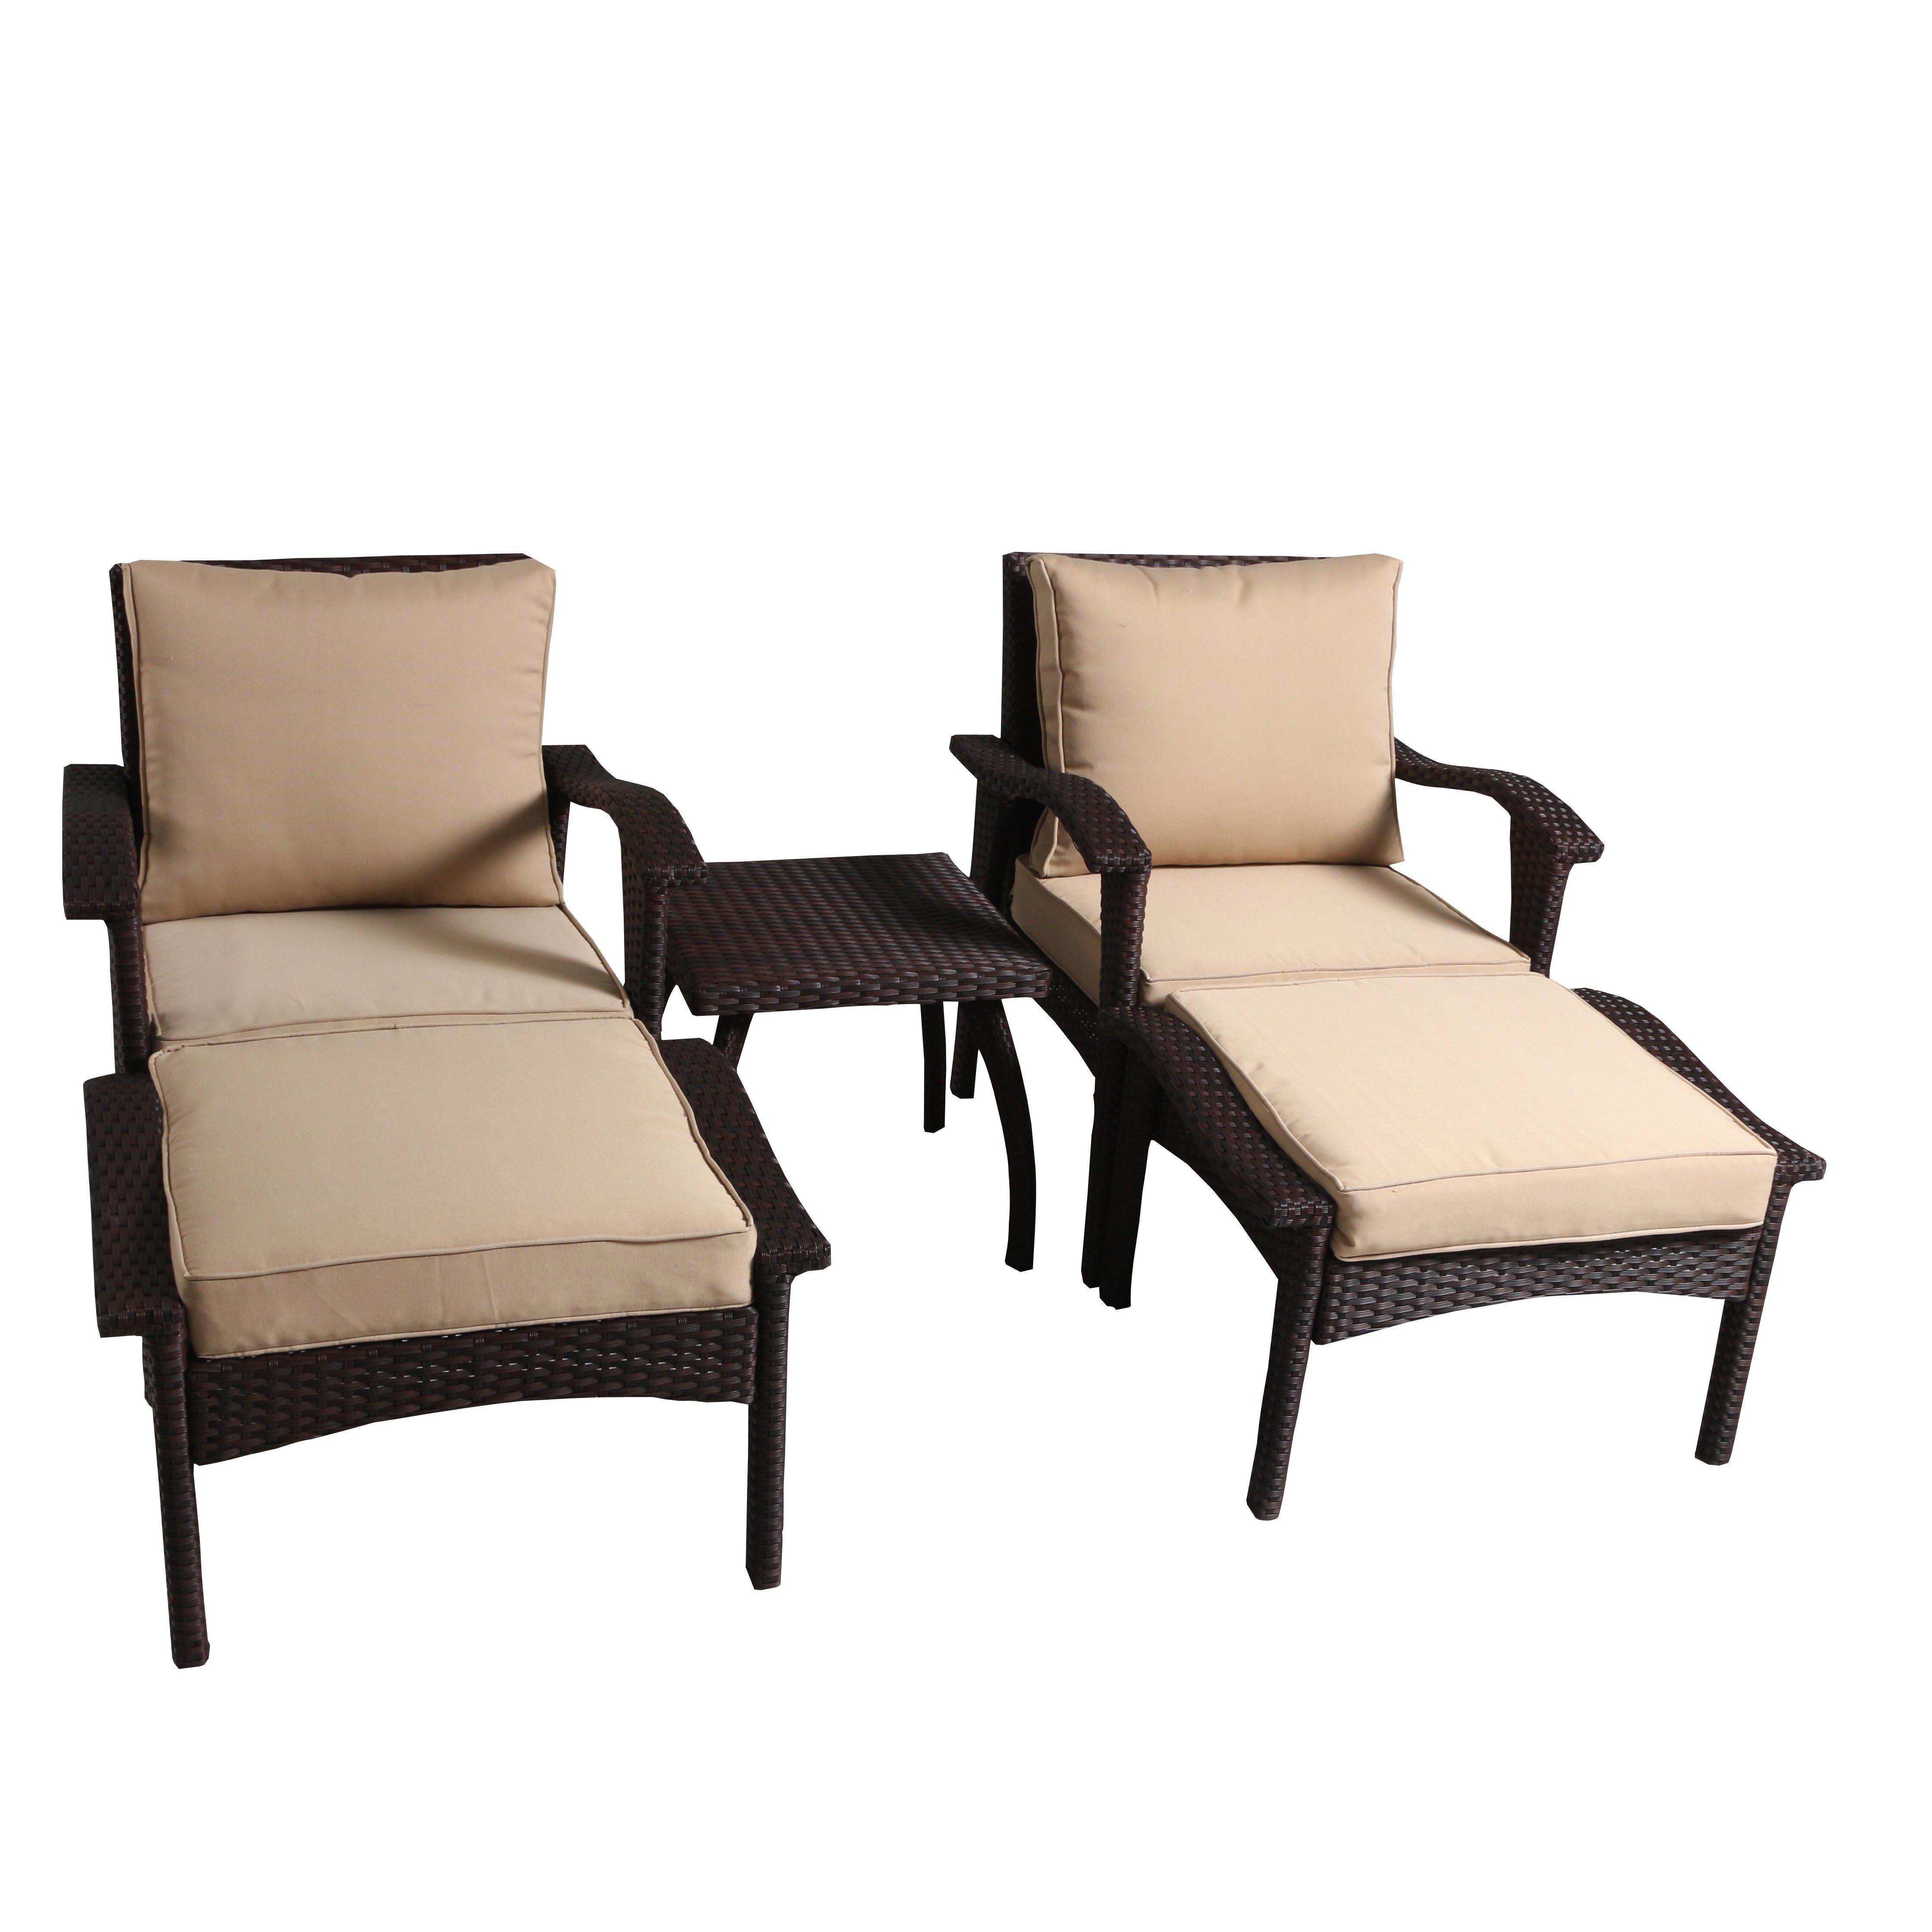 ... 5 Piece Terrison Patio Seating Group; 5 Simple Methods For Teak Garden Furniture  Birmingham Revealed ...